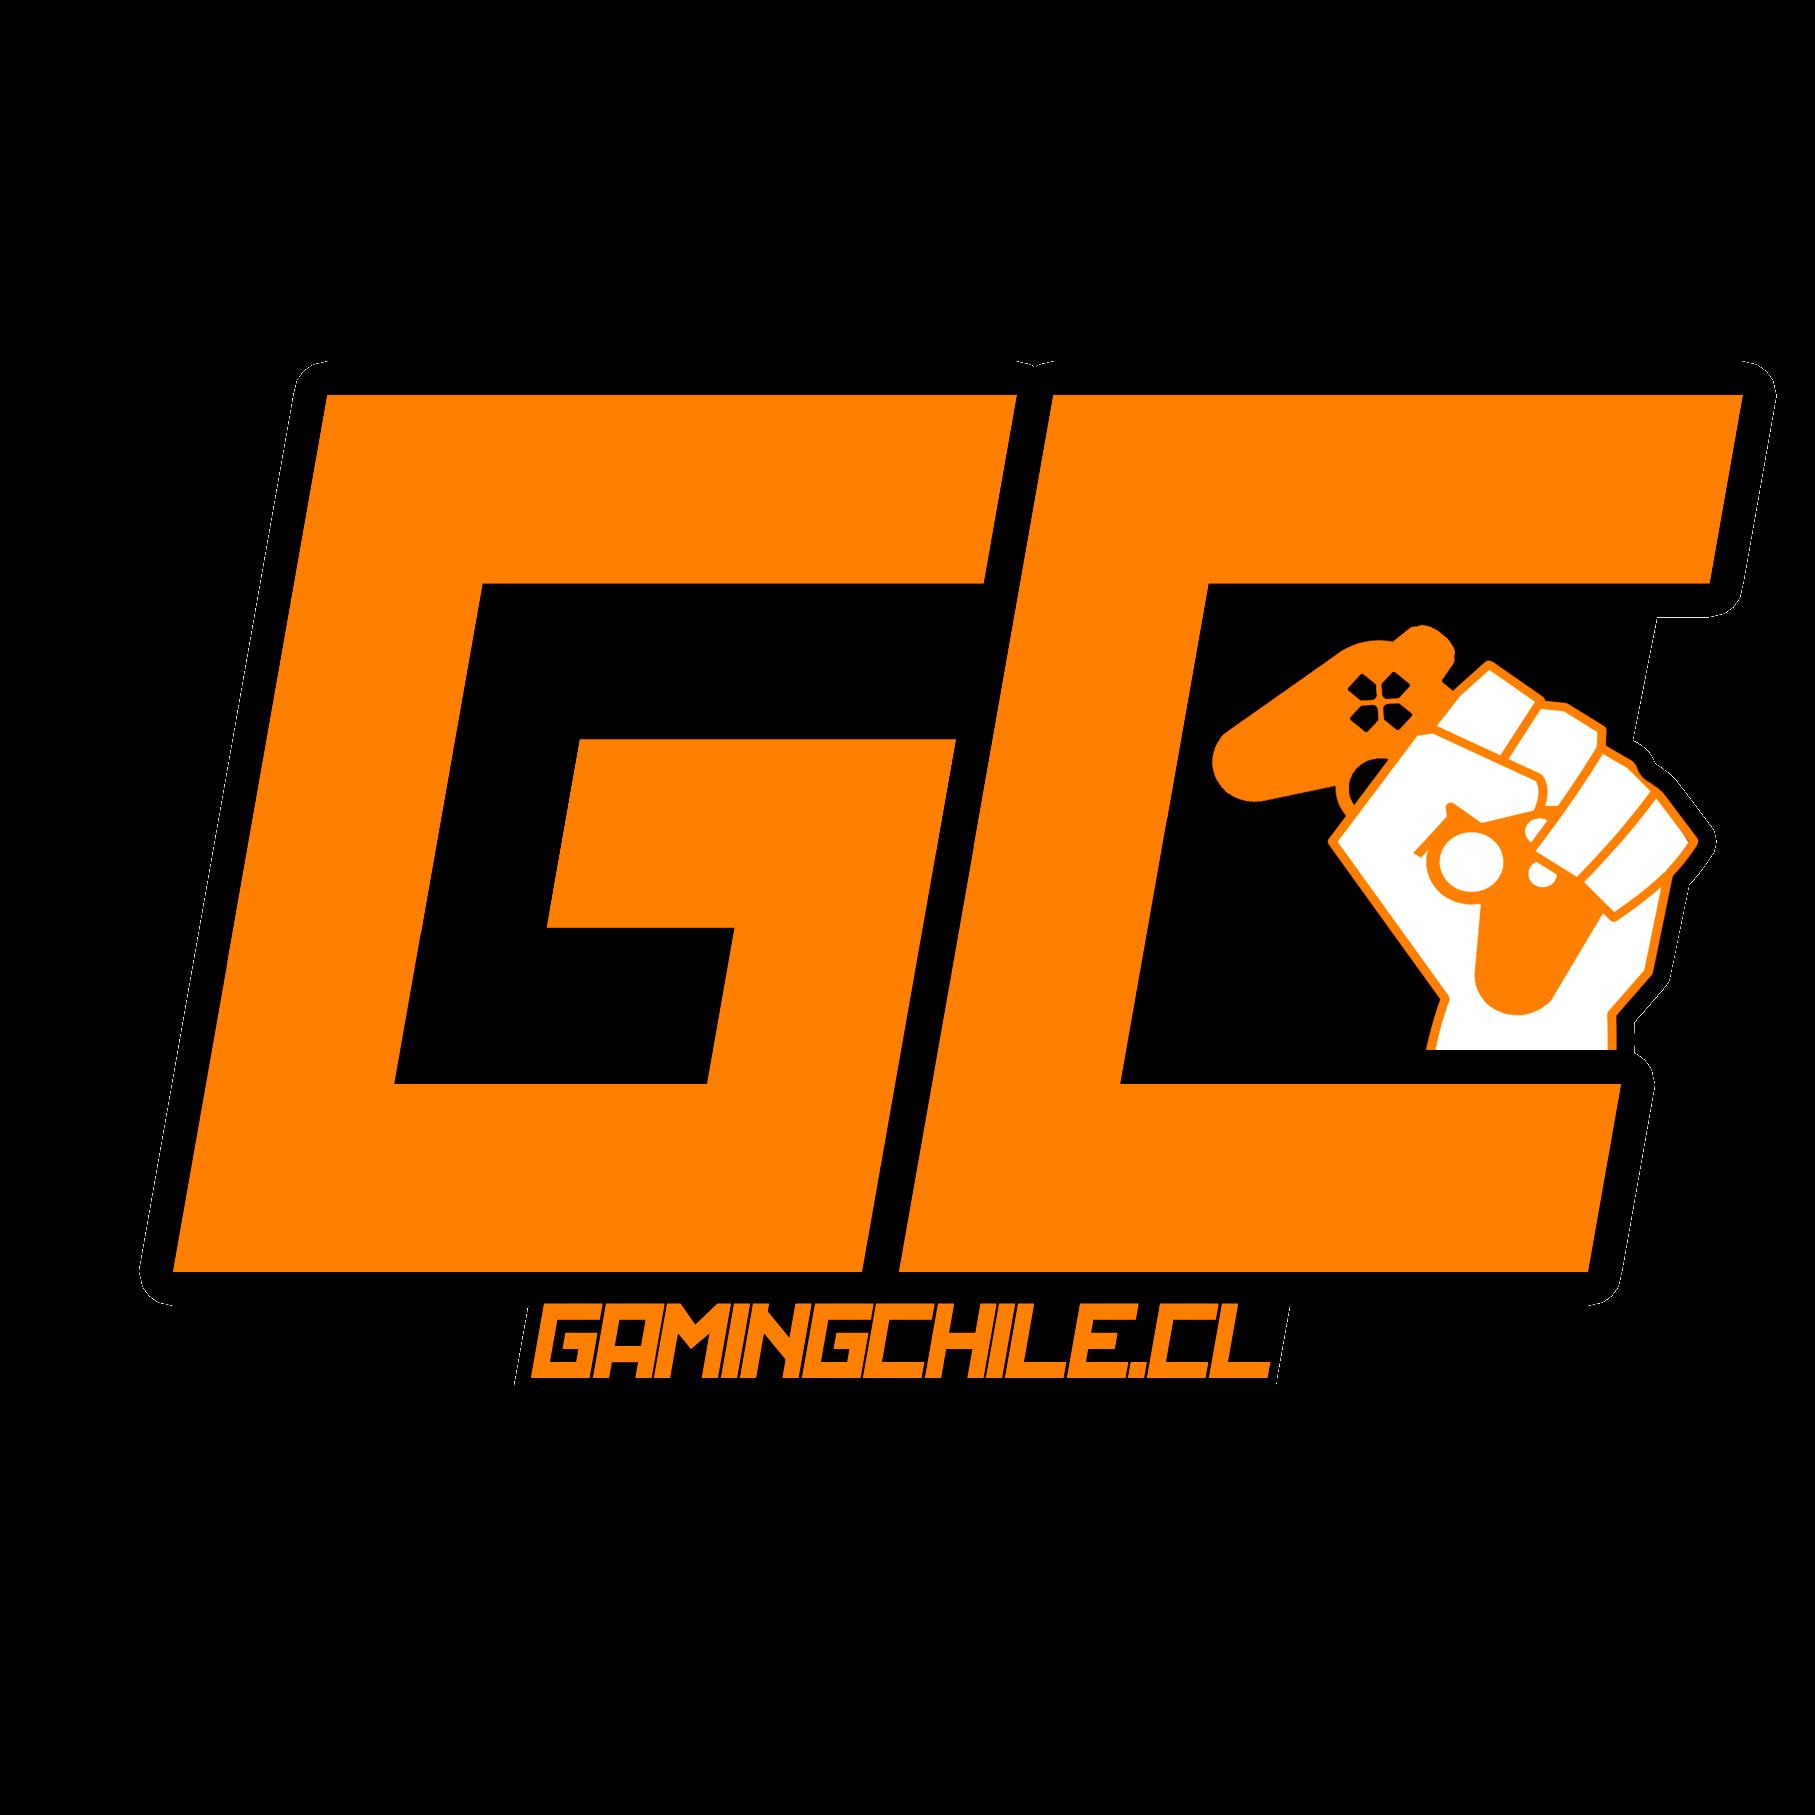 GamingChile